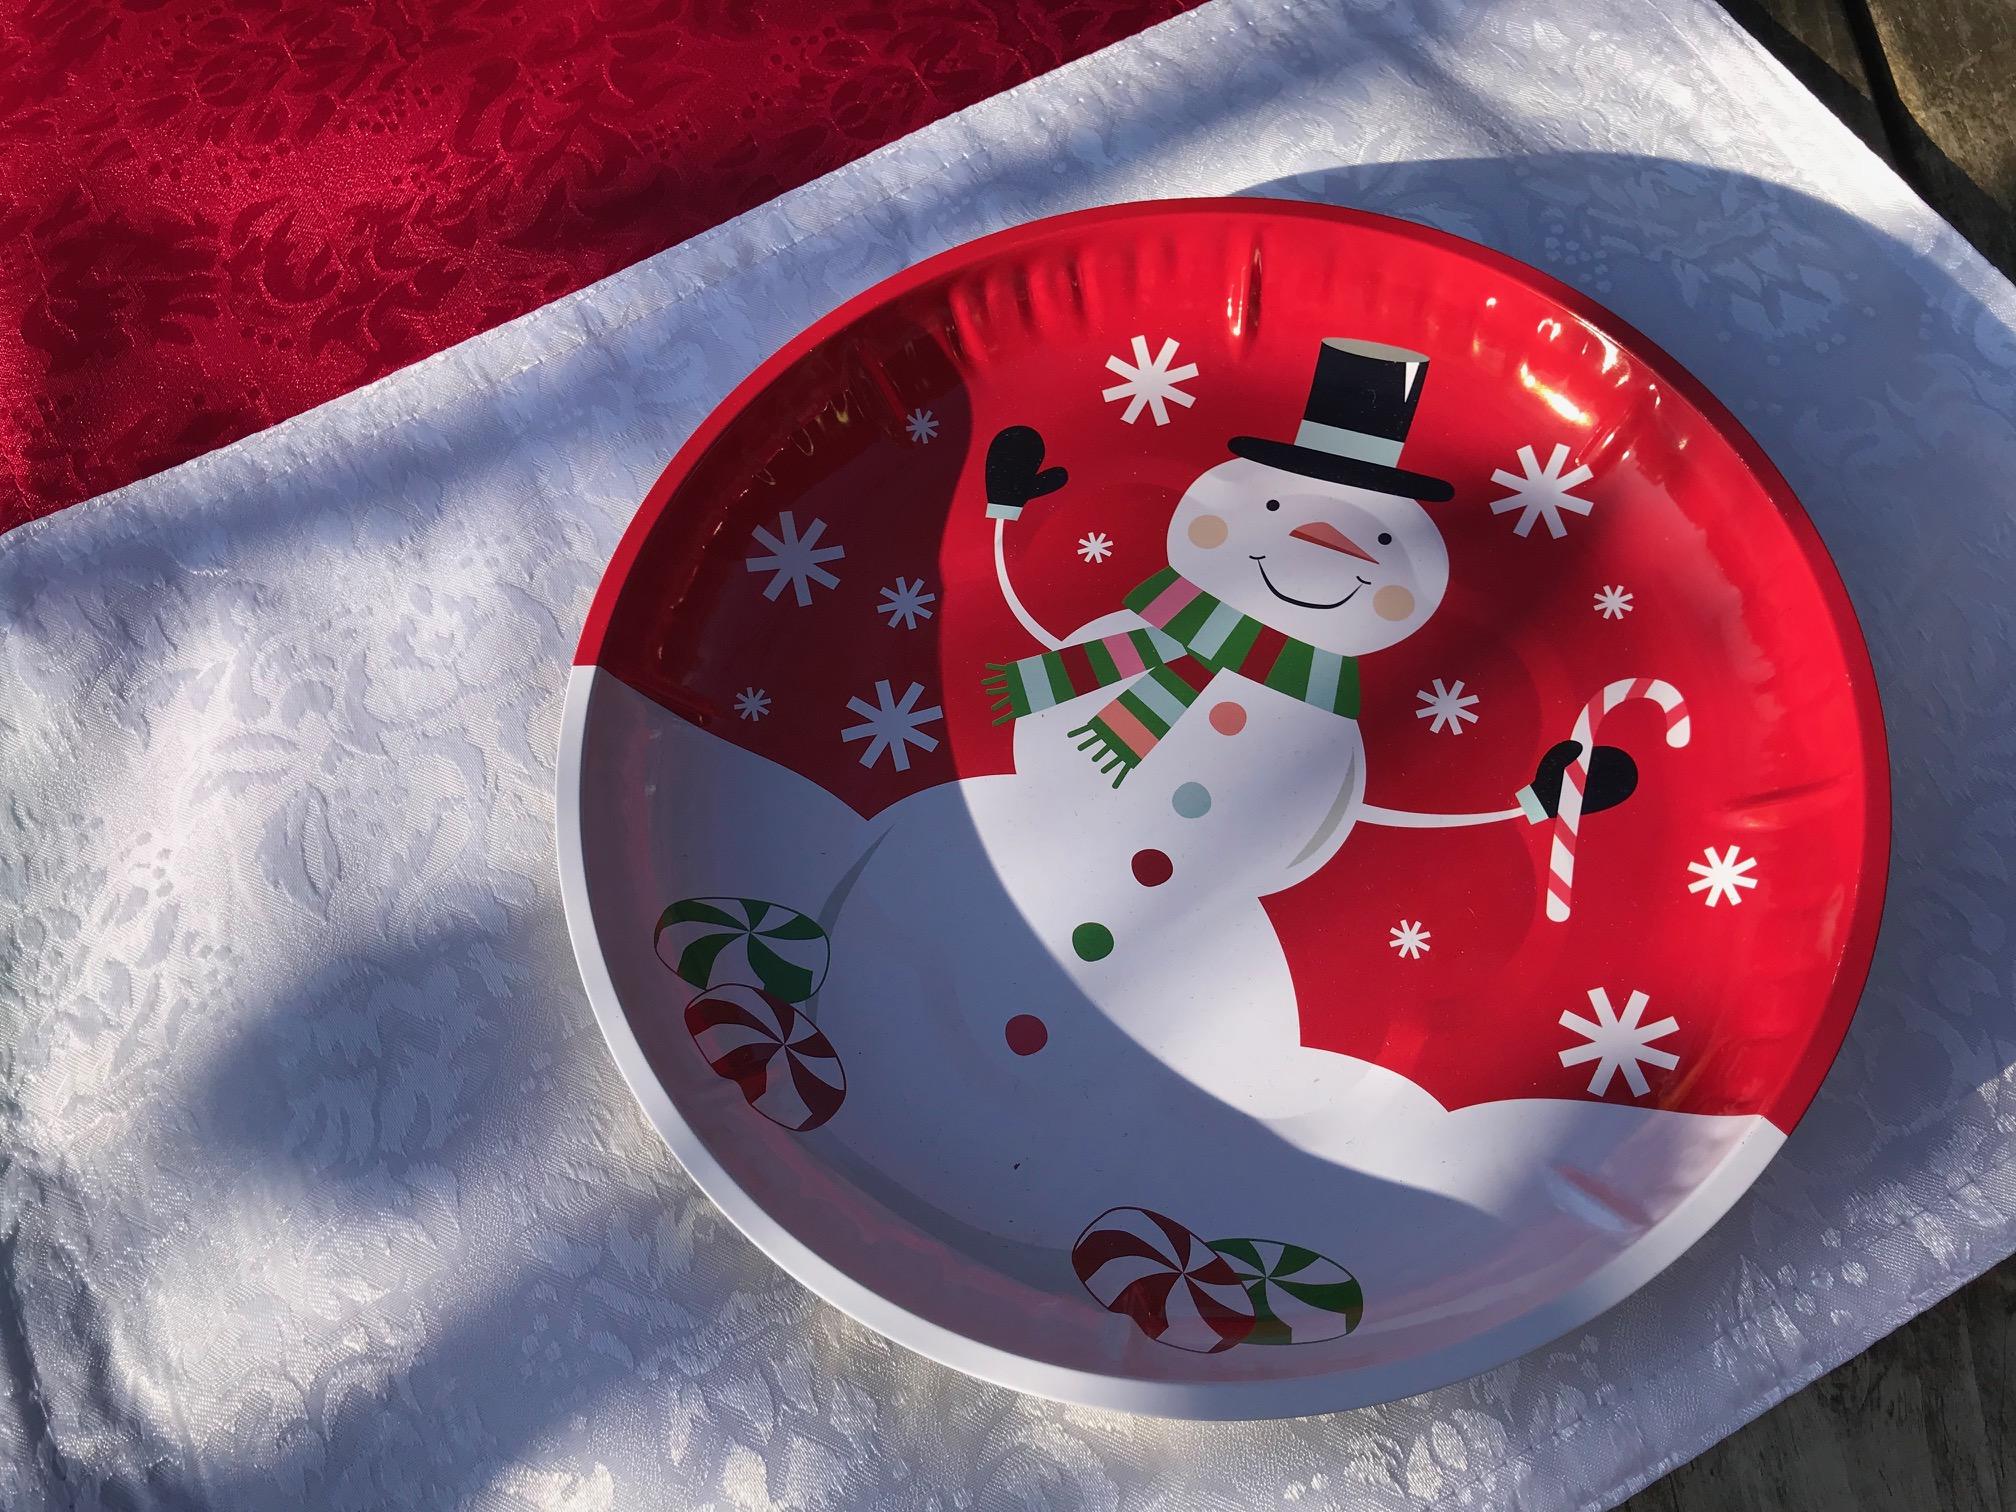 2018 Dollar Store Snowman Design Metal Tray / Plate: Lead Free!